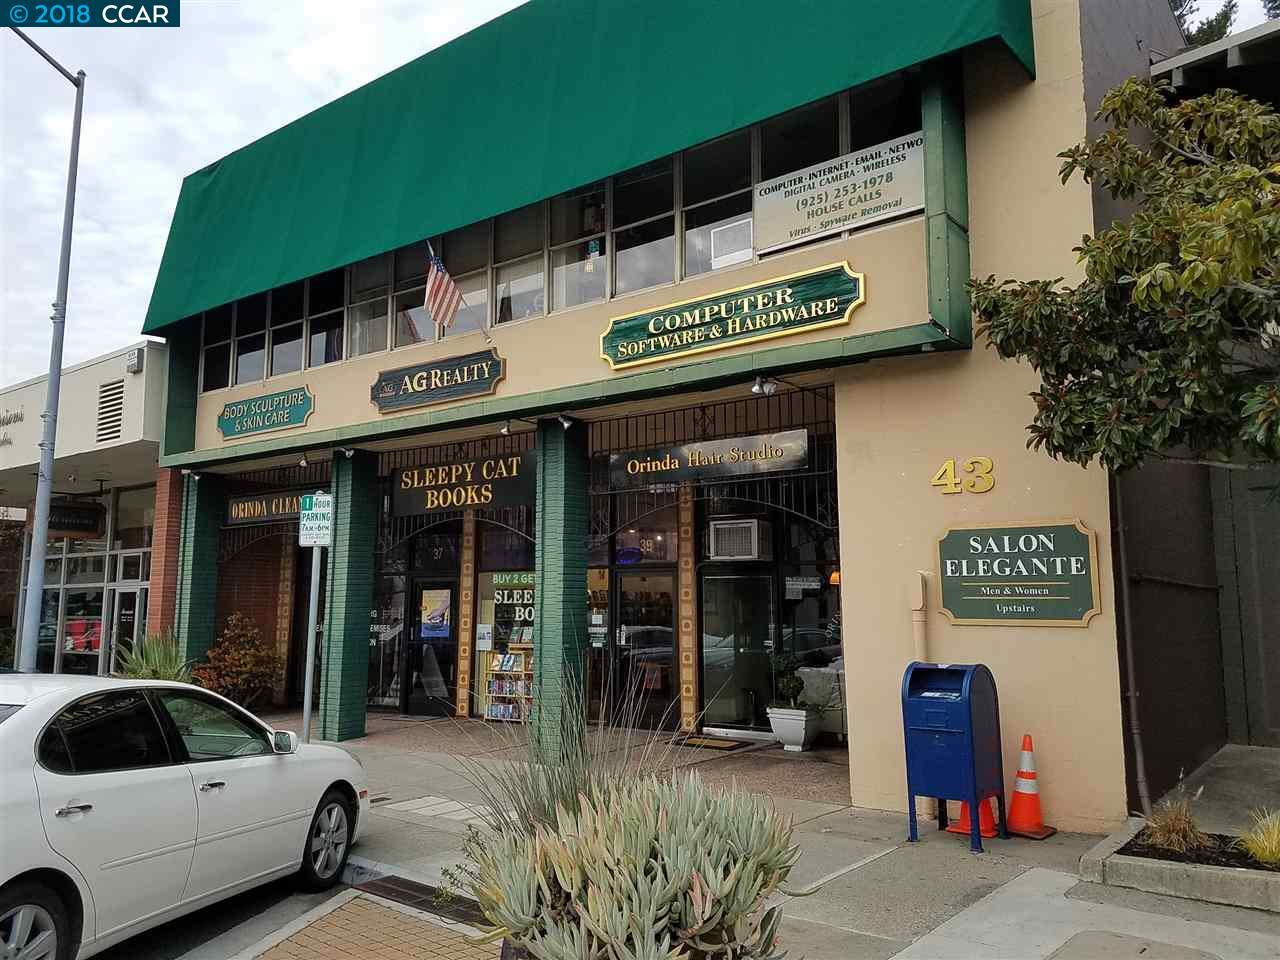 Commercial للـ Sale في 37 Moraga Way 37 Moraga Way Orinda, California 94563 United States